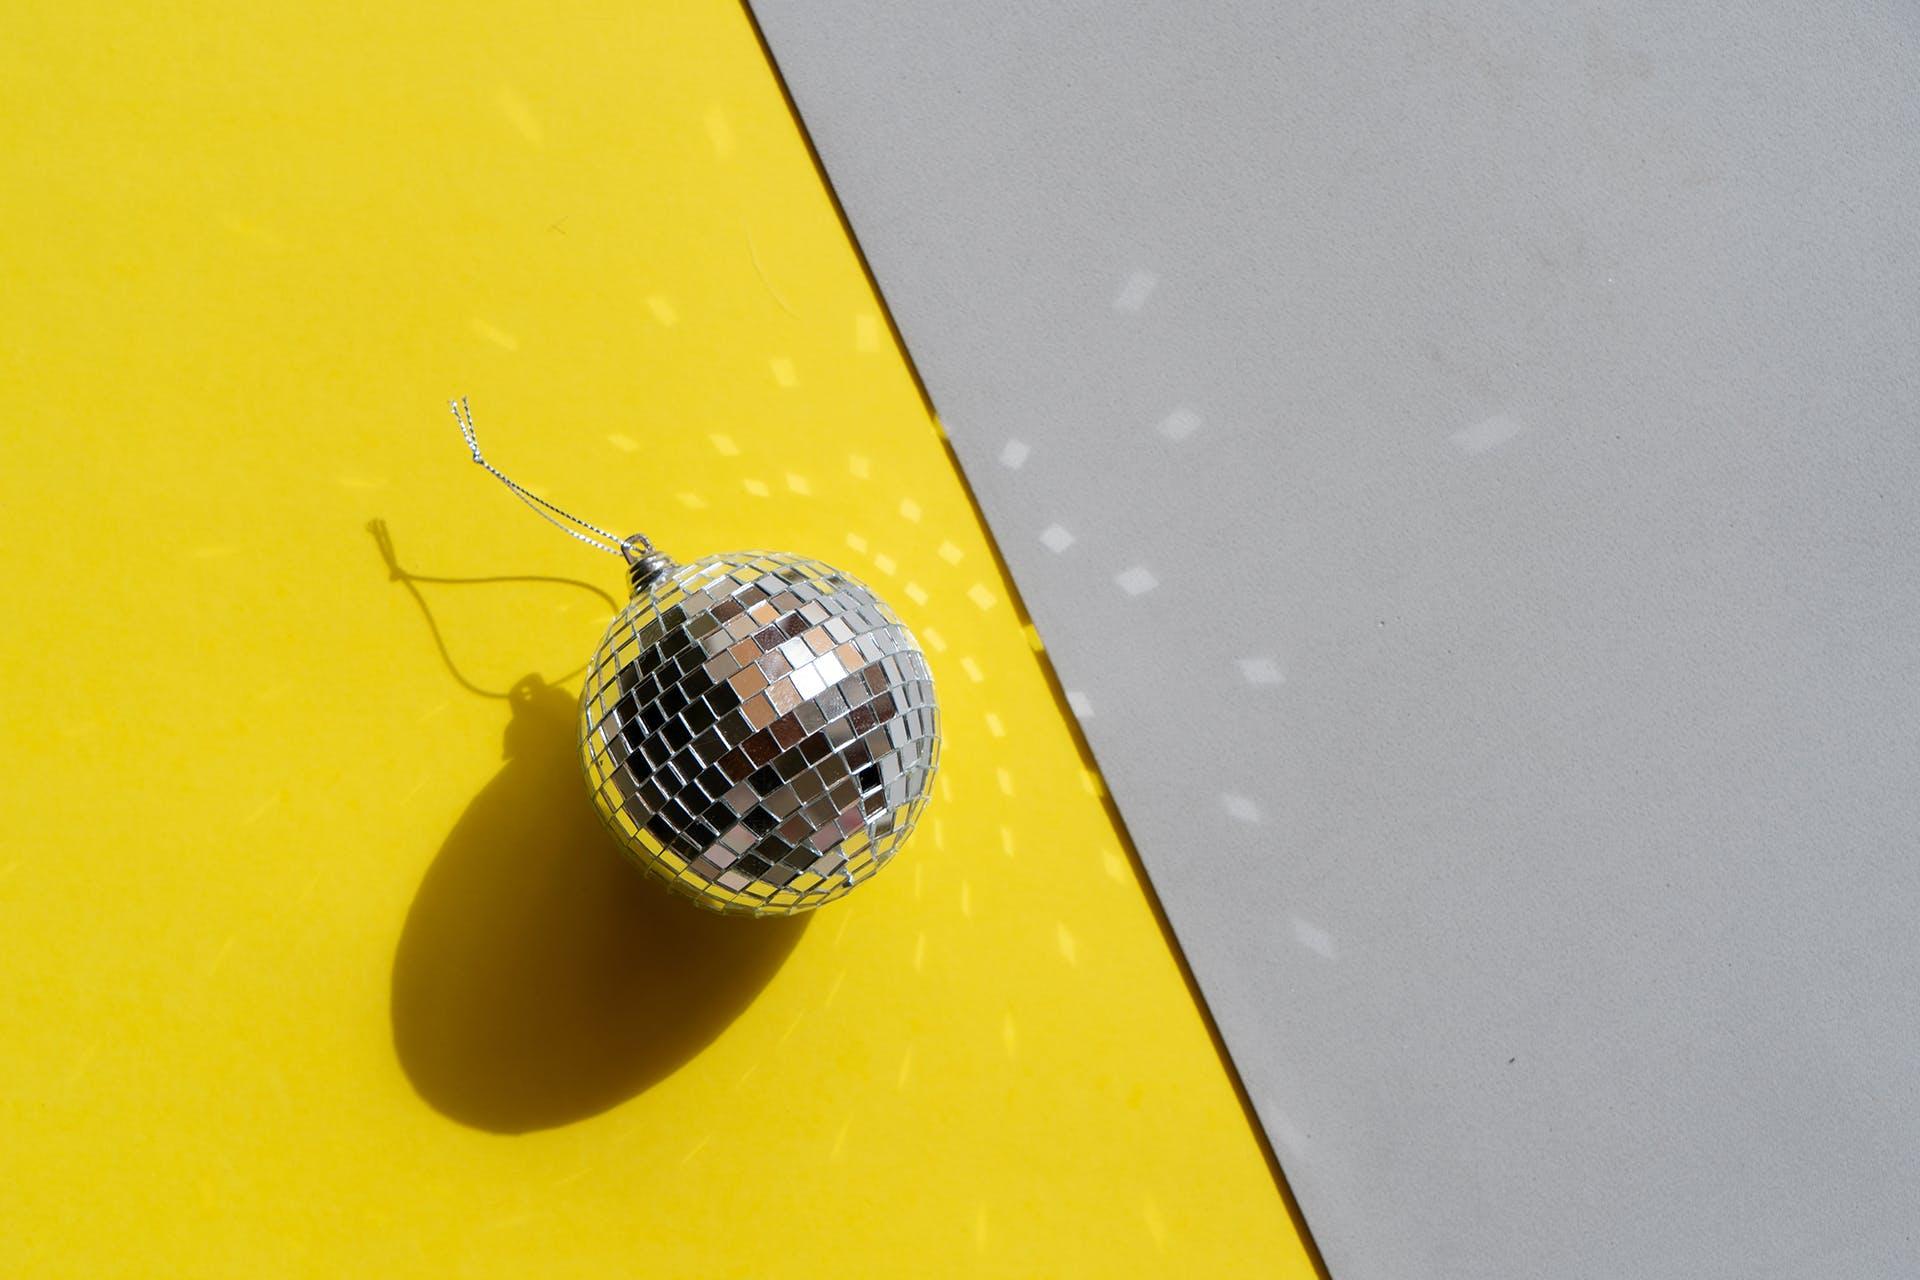 Mini disco ball on yellow and grey background